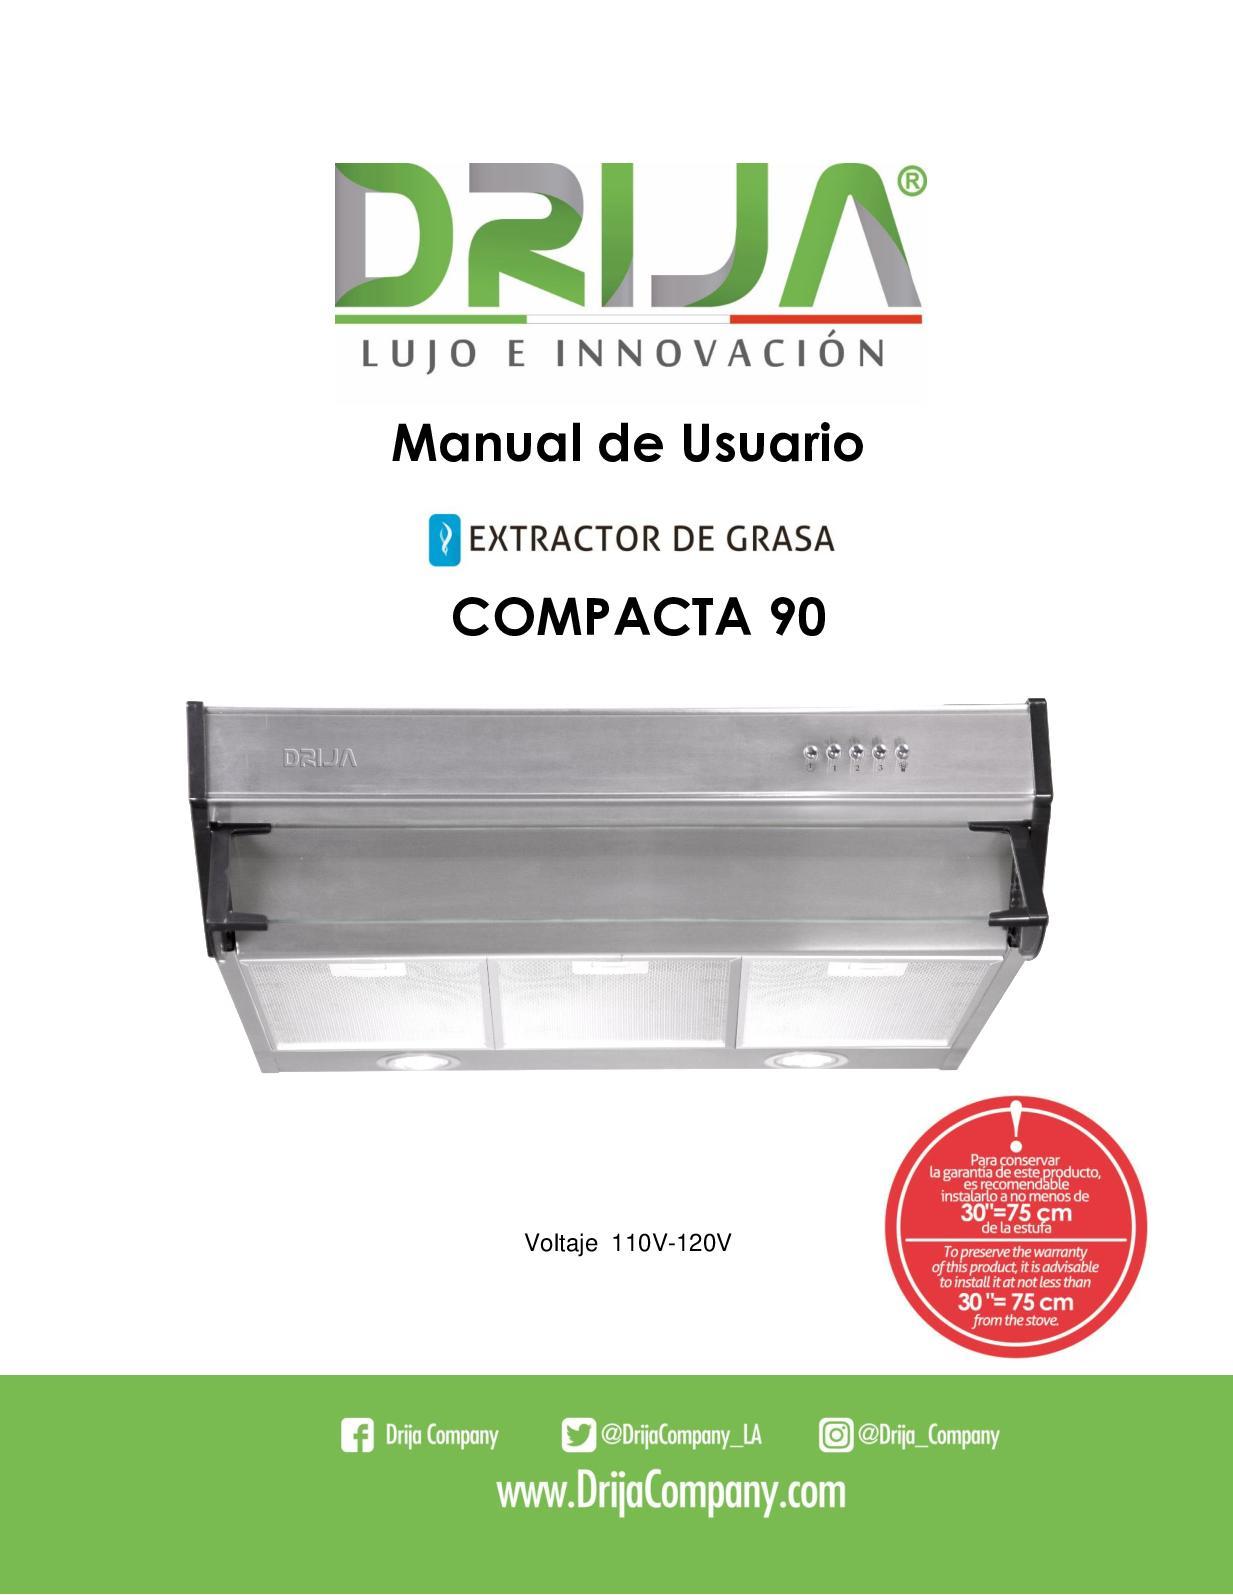 Compacta 90 - Manual Español- Drija